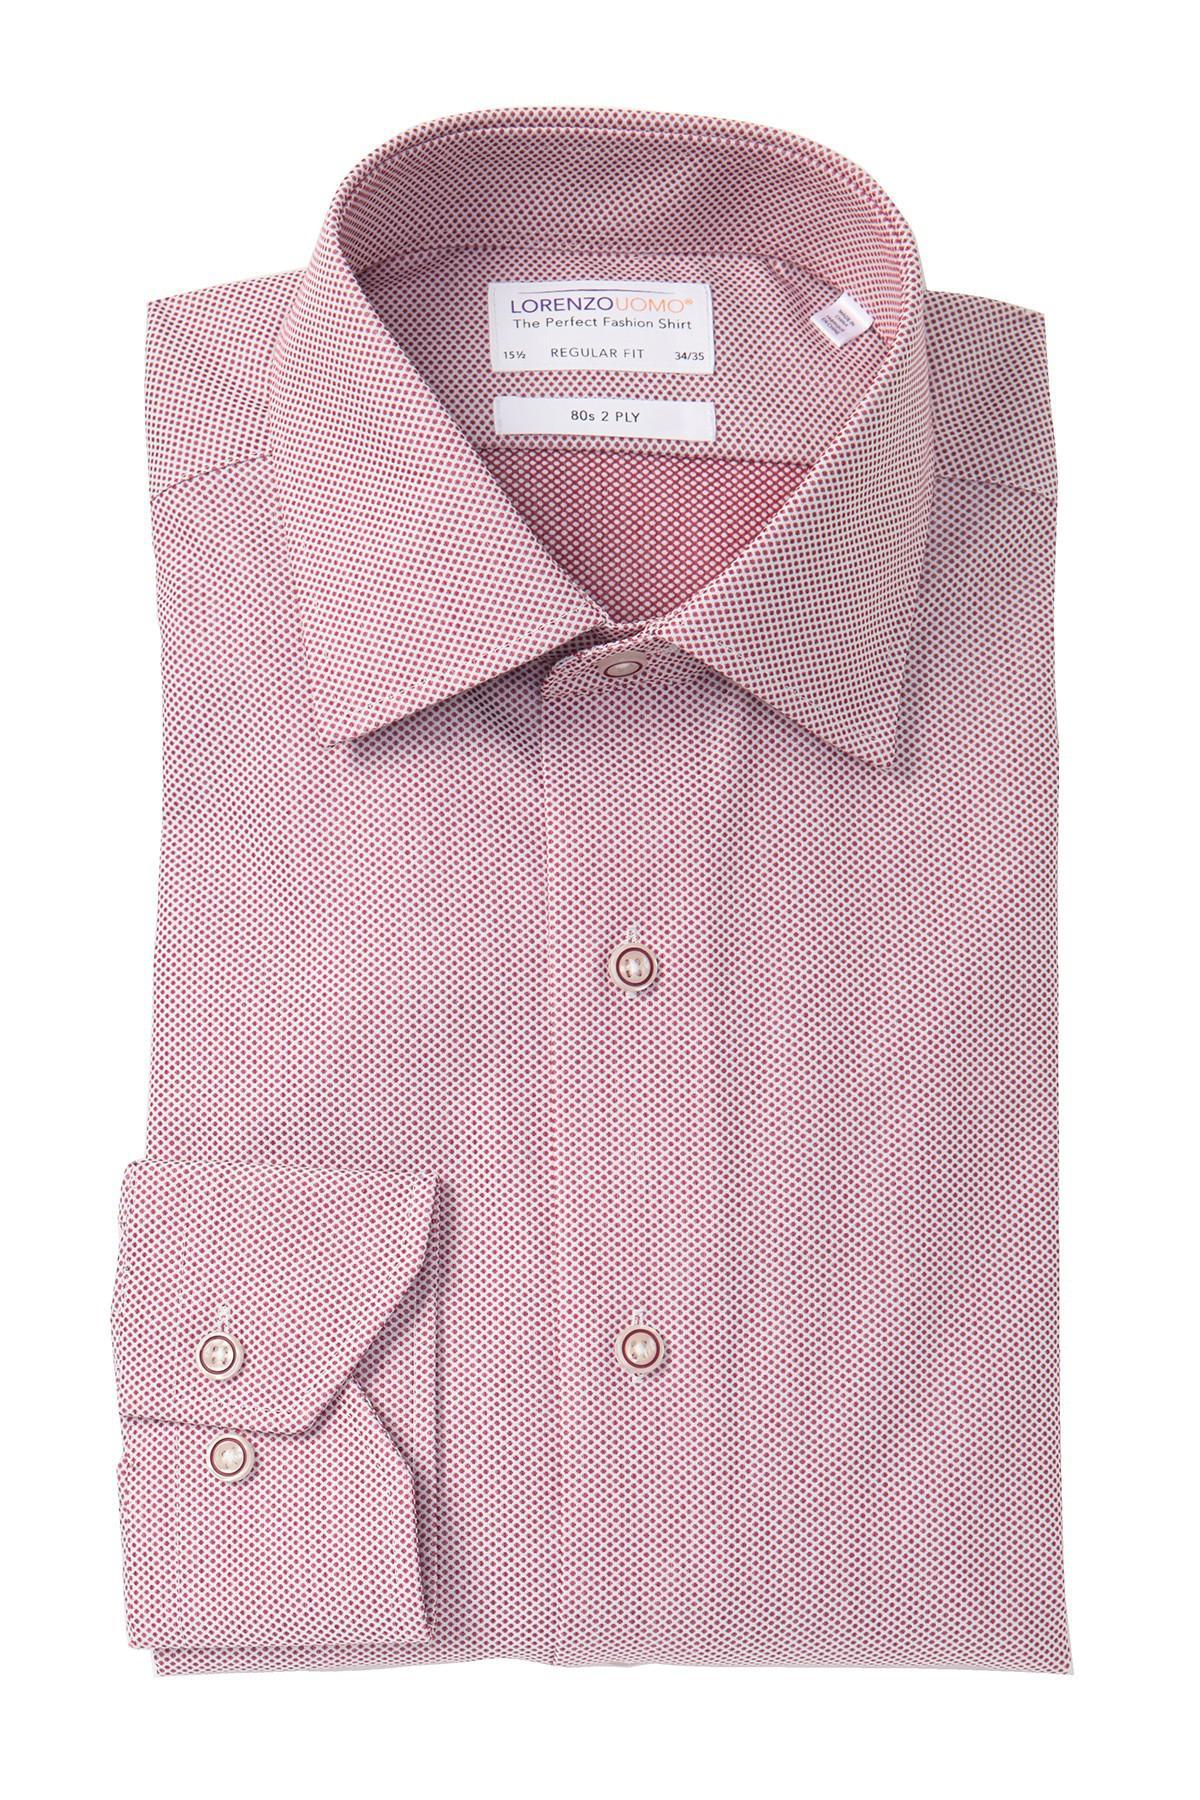 Lorenzo Uomo Cotton Textured Dots Regular Fit Dress Shirt